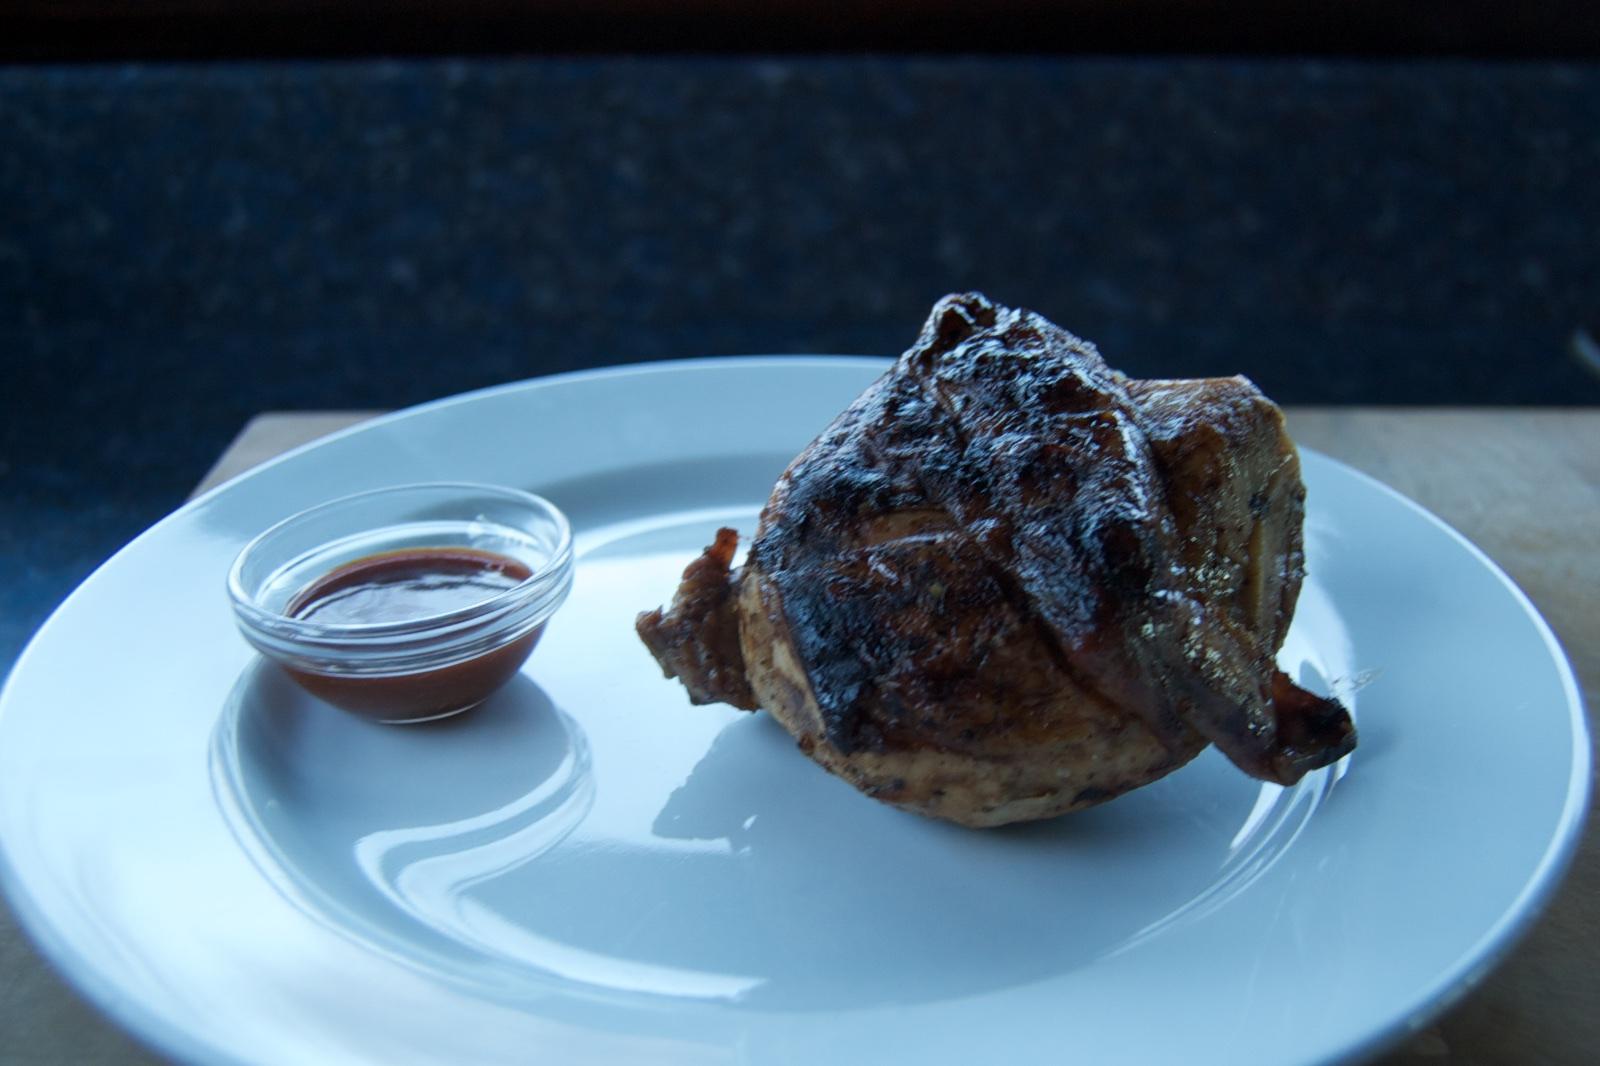 http://blog.rickk.com/food/2014/11/10/ate.2014.11.10.d.jpg